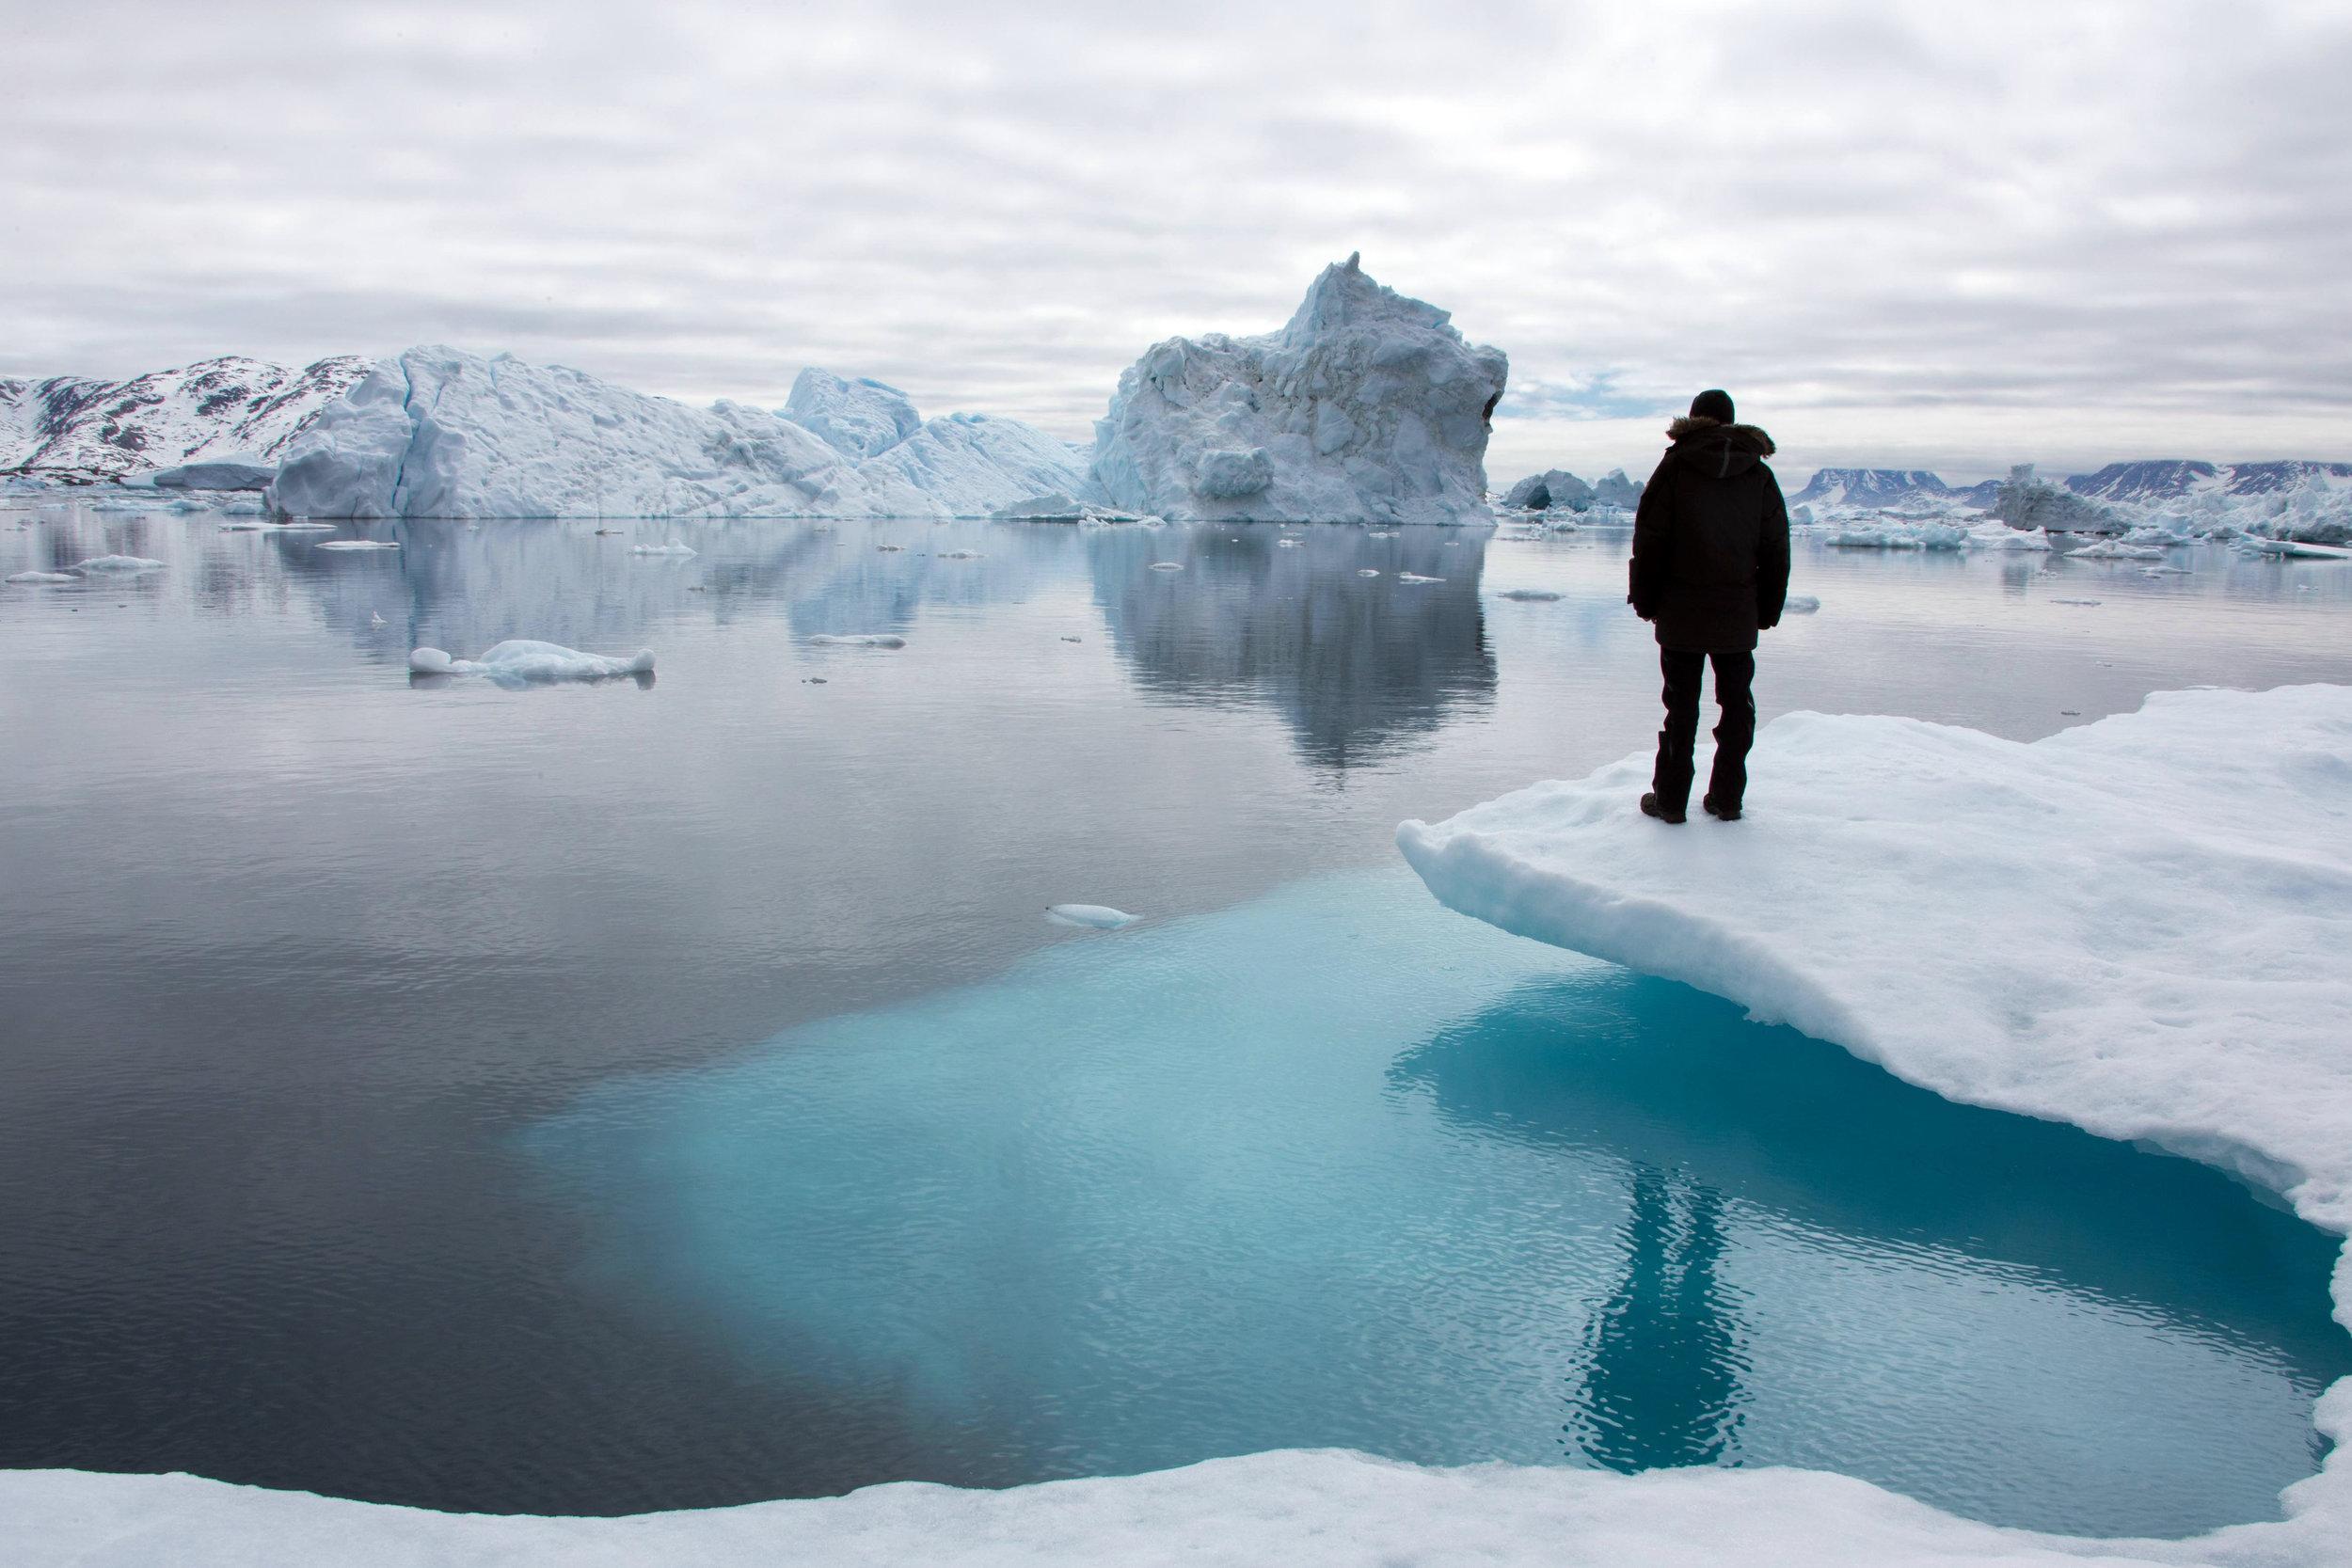 Standing on an iceberg off the coast of Tinit, East Greenland. Photo: Matt Reichel.